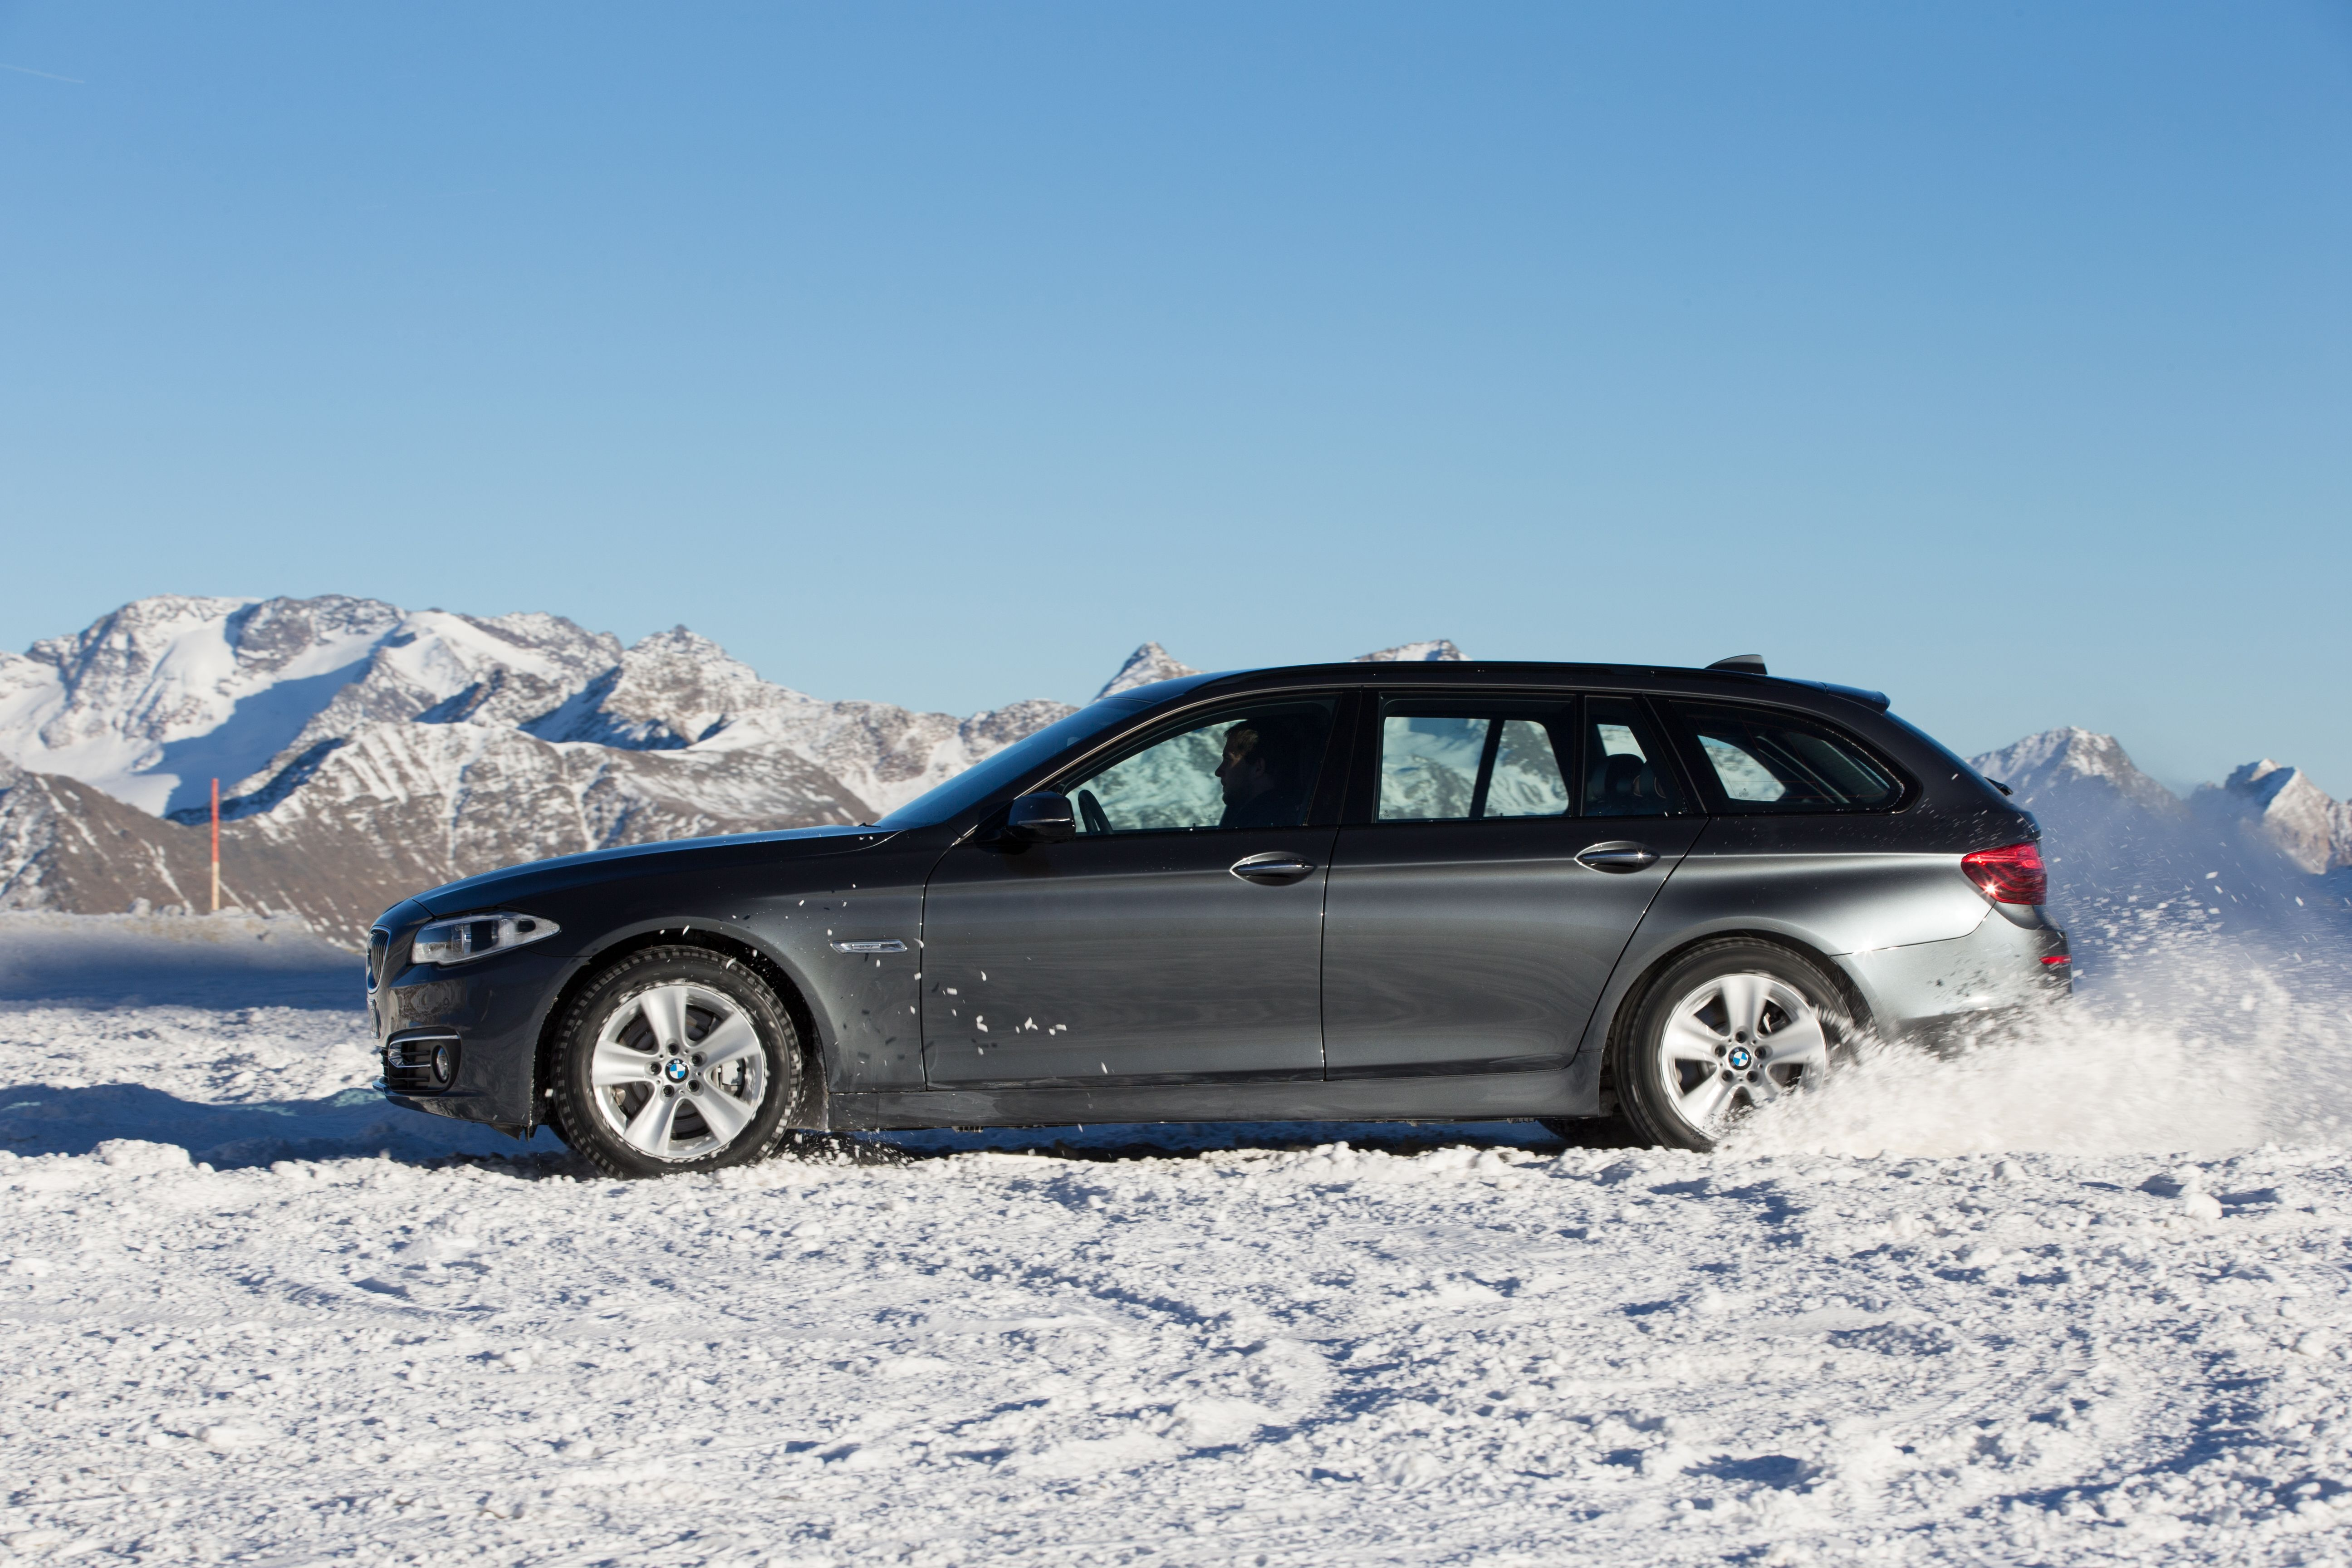 F11 alpina b5 biturbo touring page 2 5series net forums -  Bmw F11 535i Touring Xdrive Winter Drift Snow